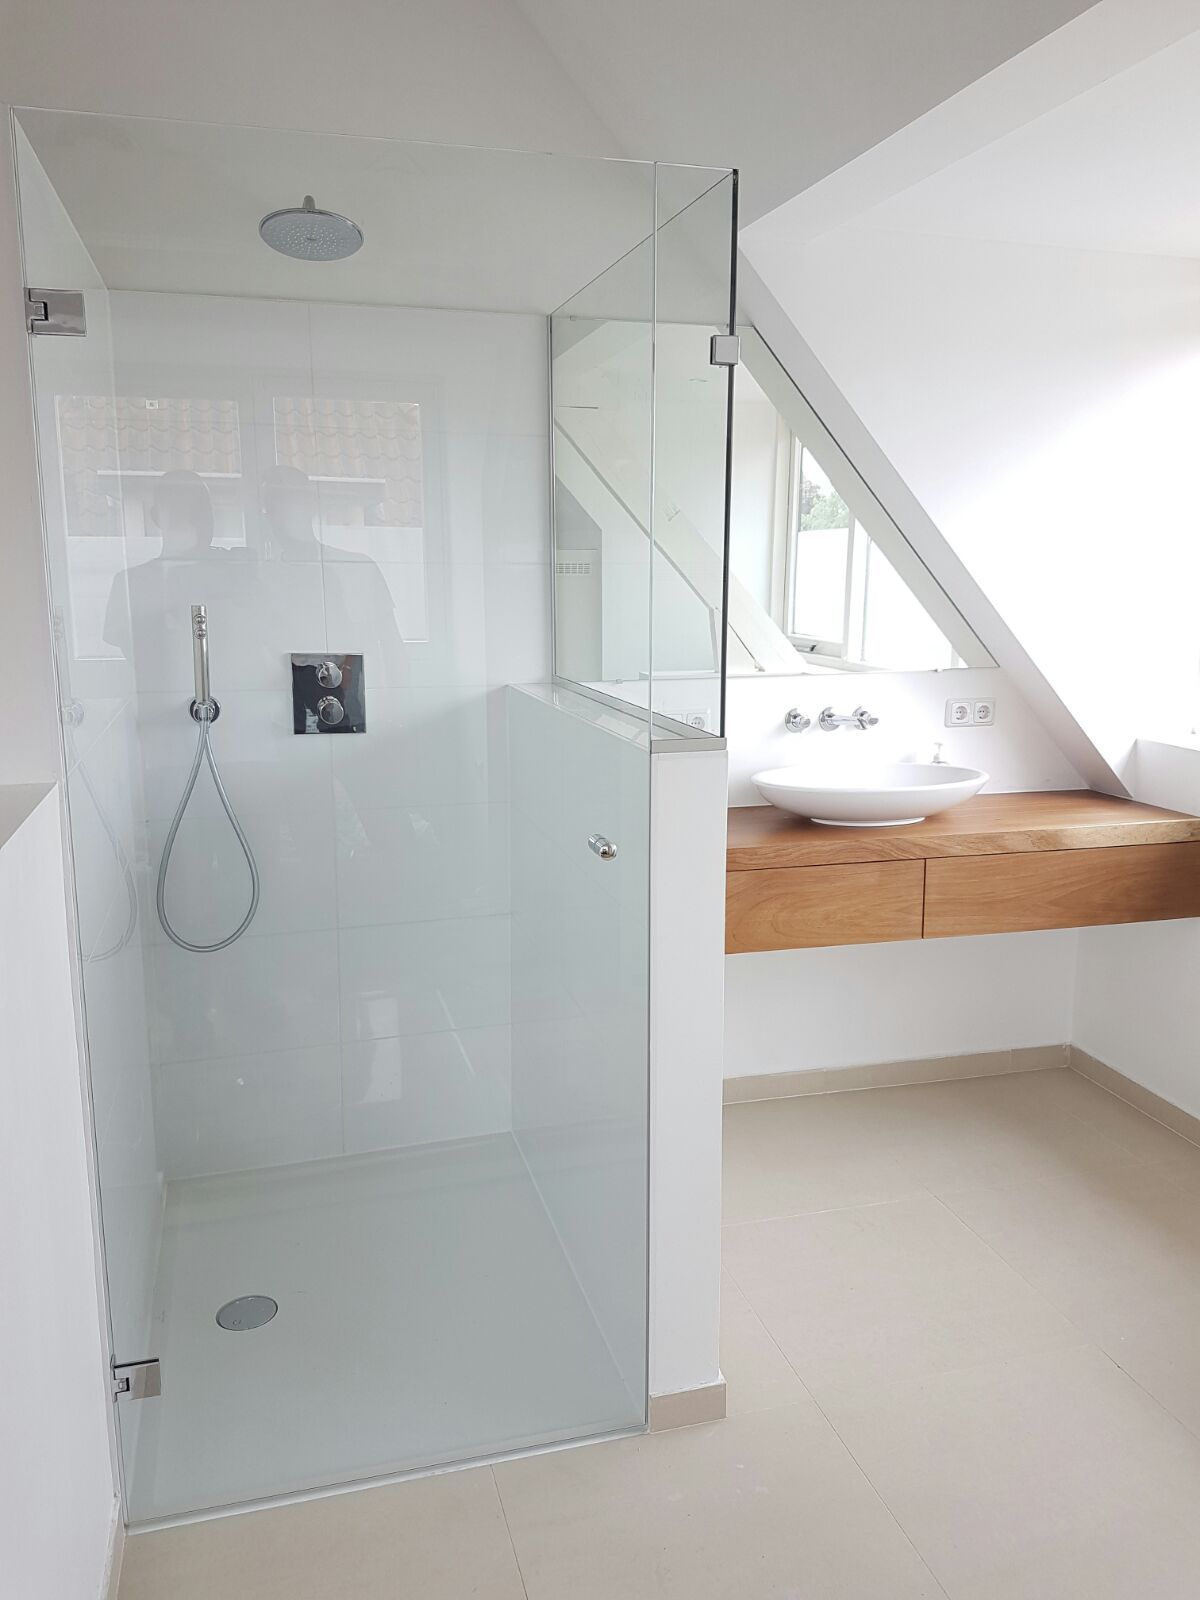 douchecabine glasbestellen badkamer pinterest attic